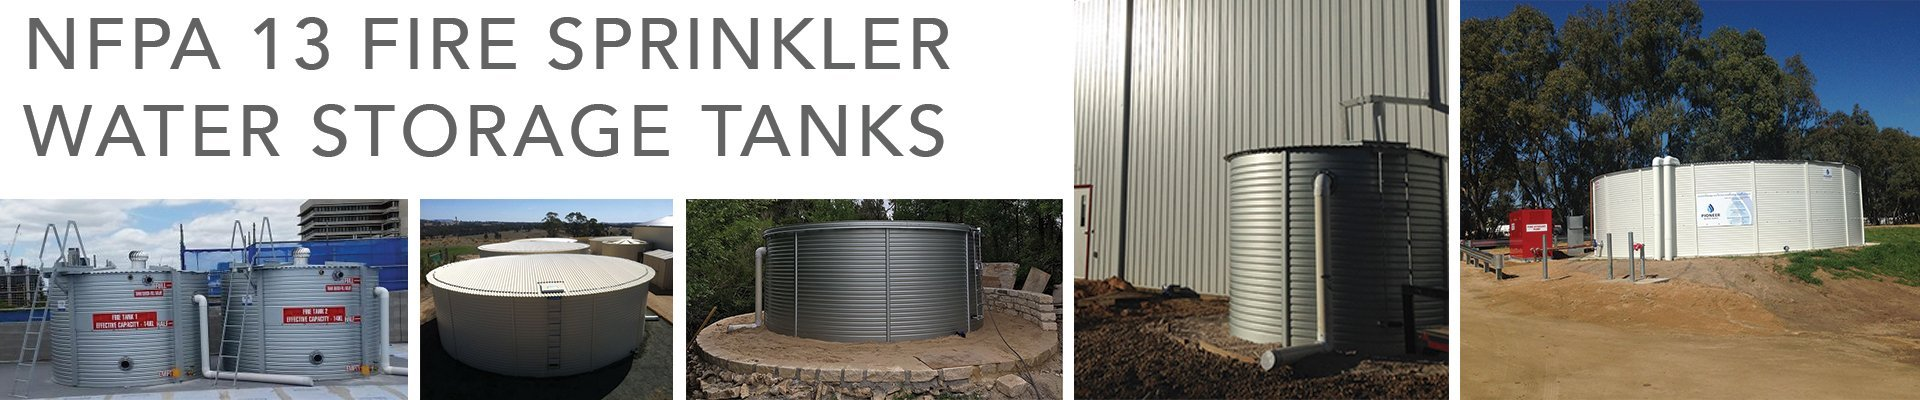 Npfa 13 Fire Sprinkler Tanks Fire Protection Water Tanks